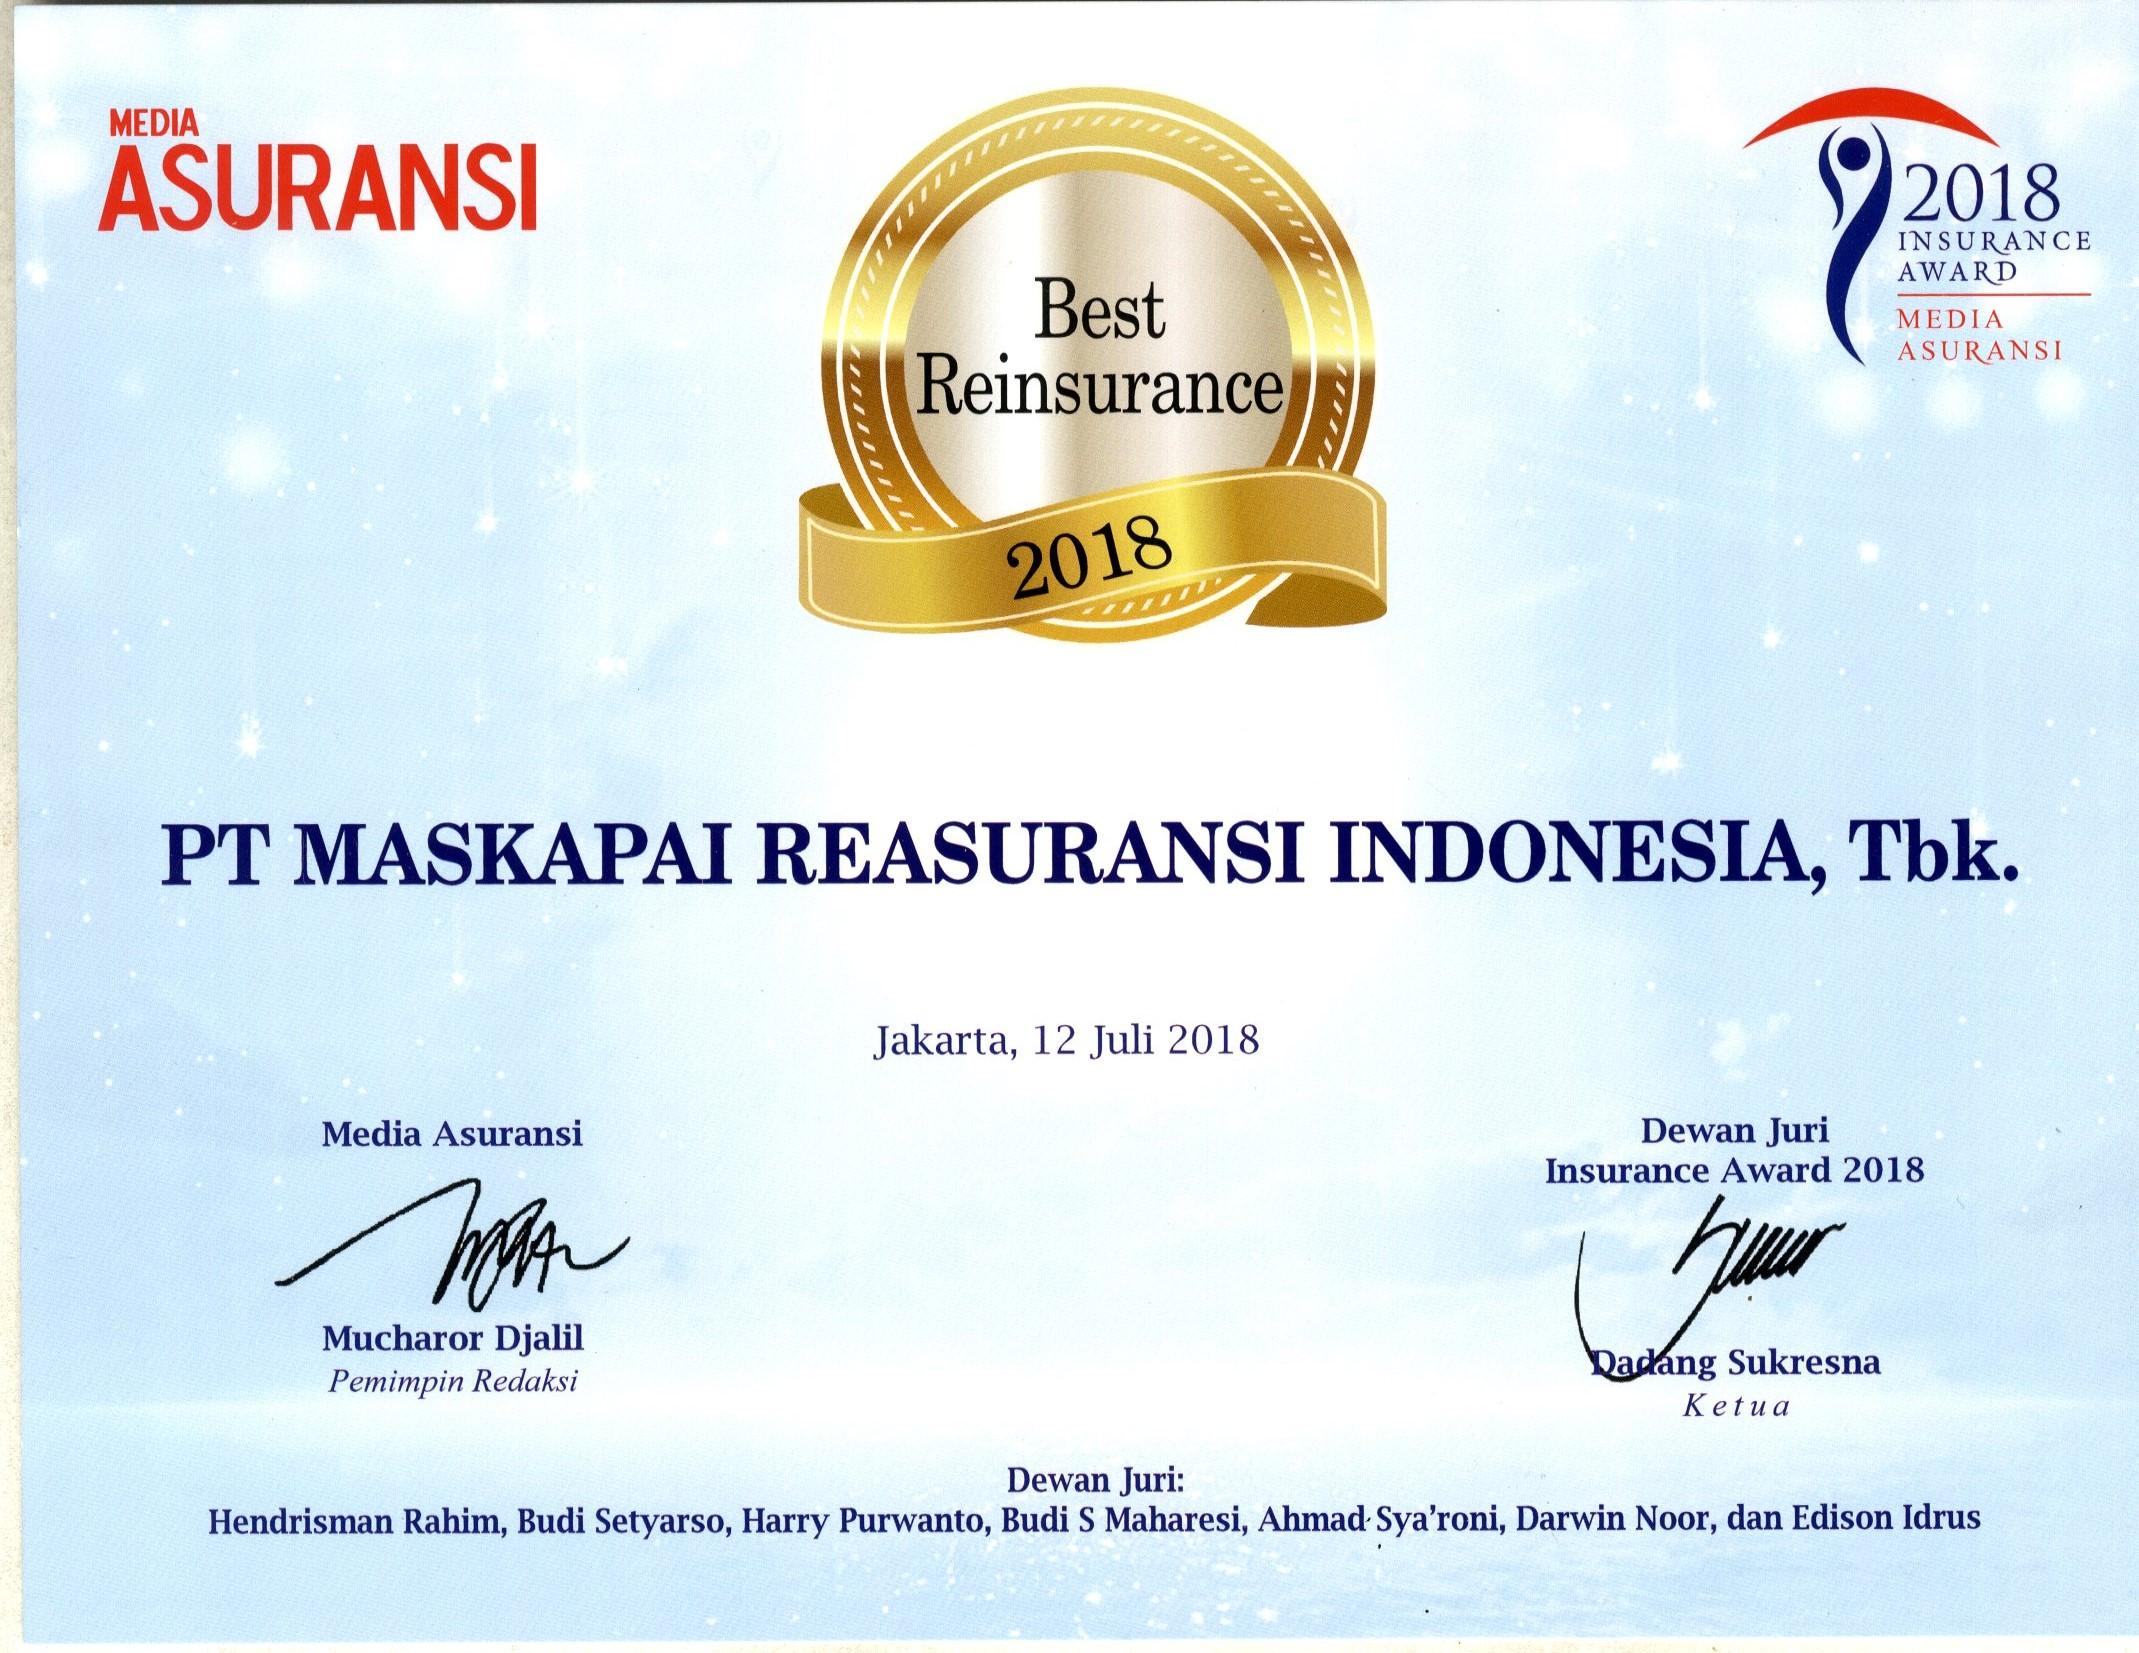 Majalah Media Asuransi : Best Reinsurance 2018